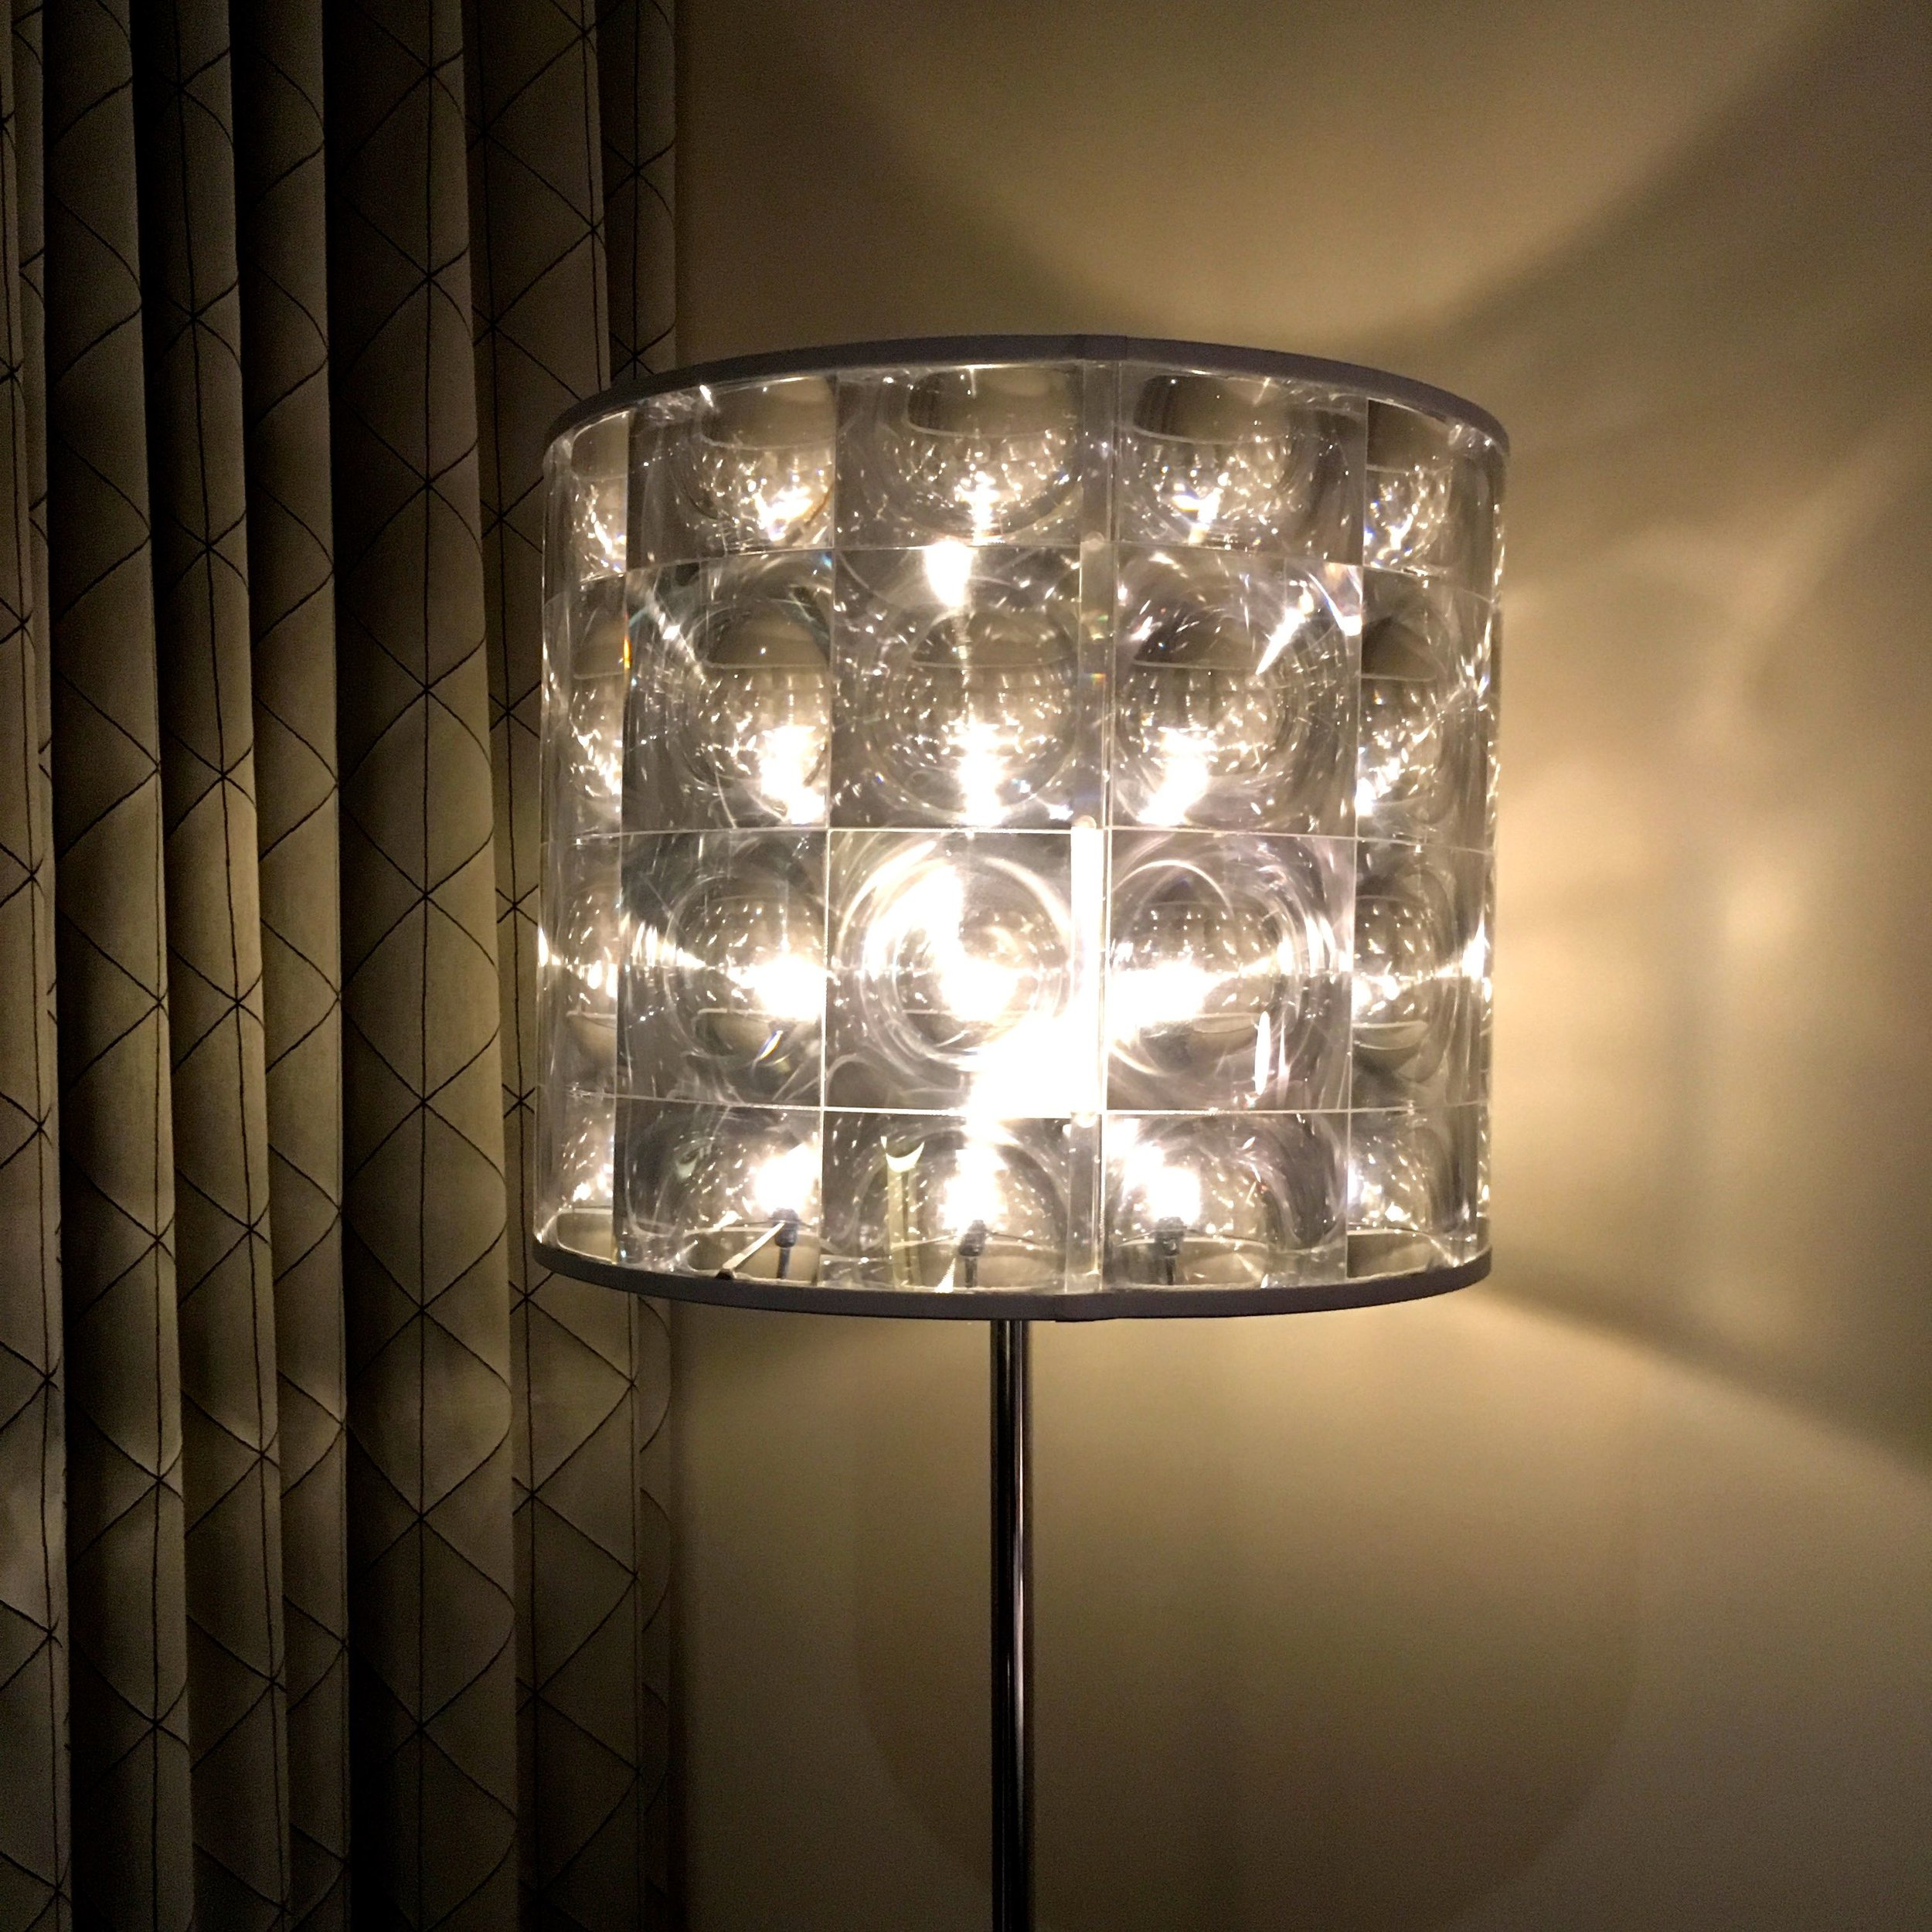 Brooklands Hotel in Weybridge, and a funky standard light too